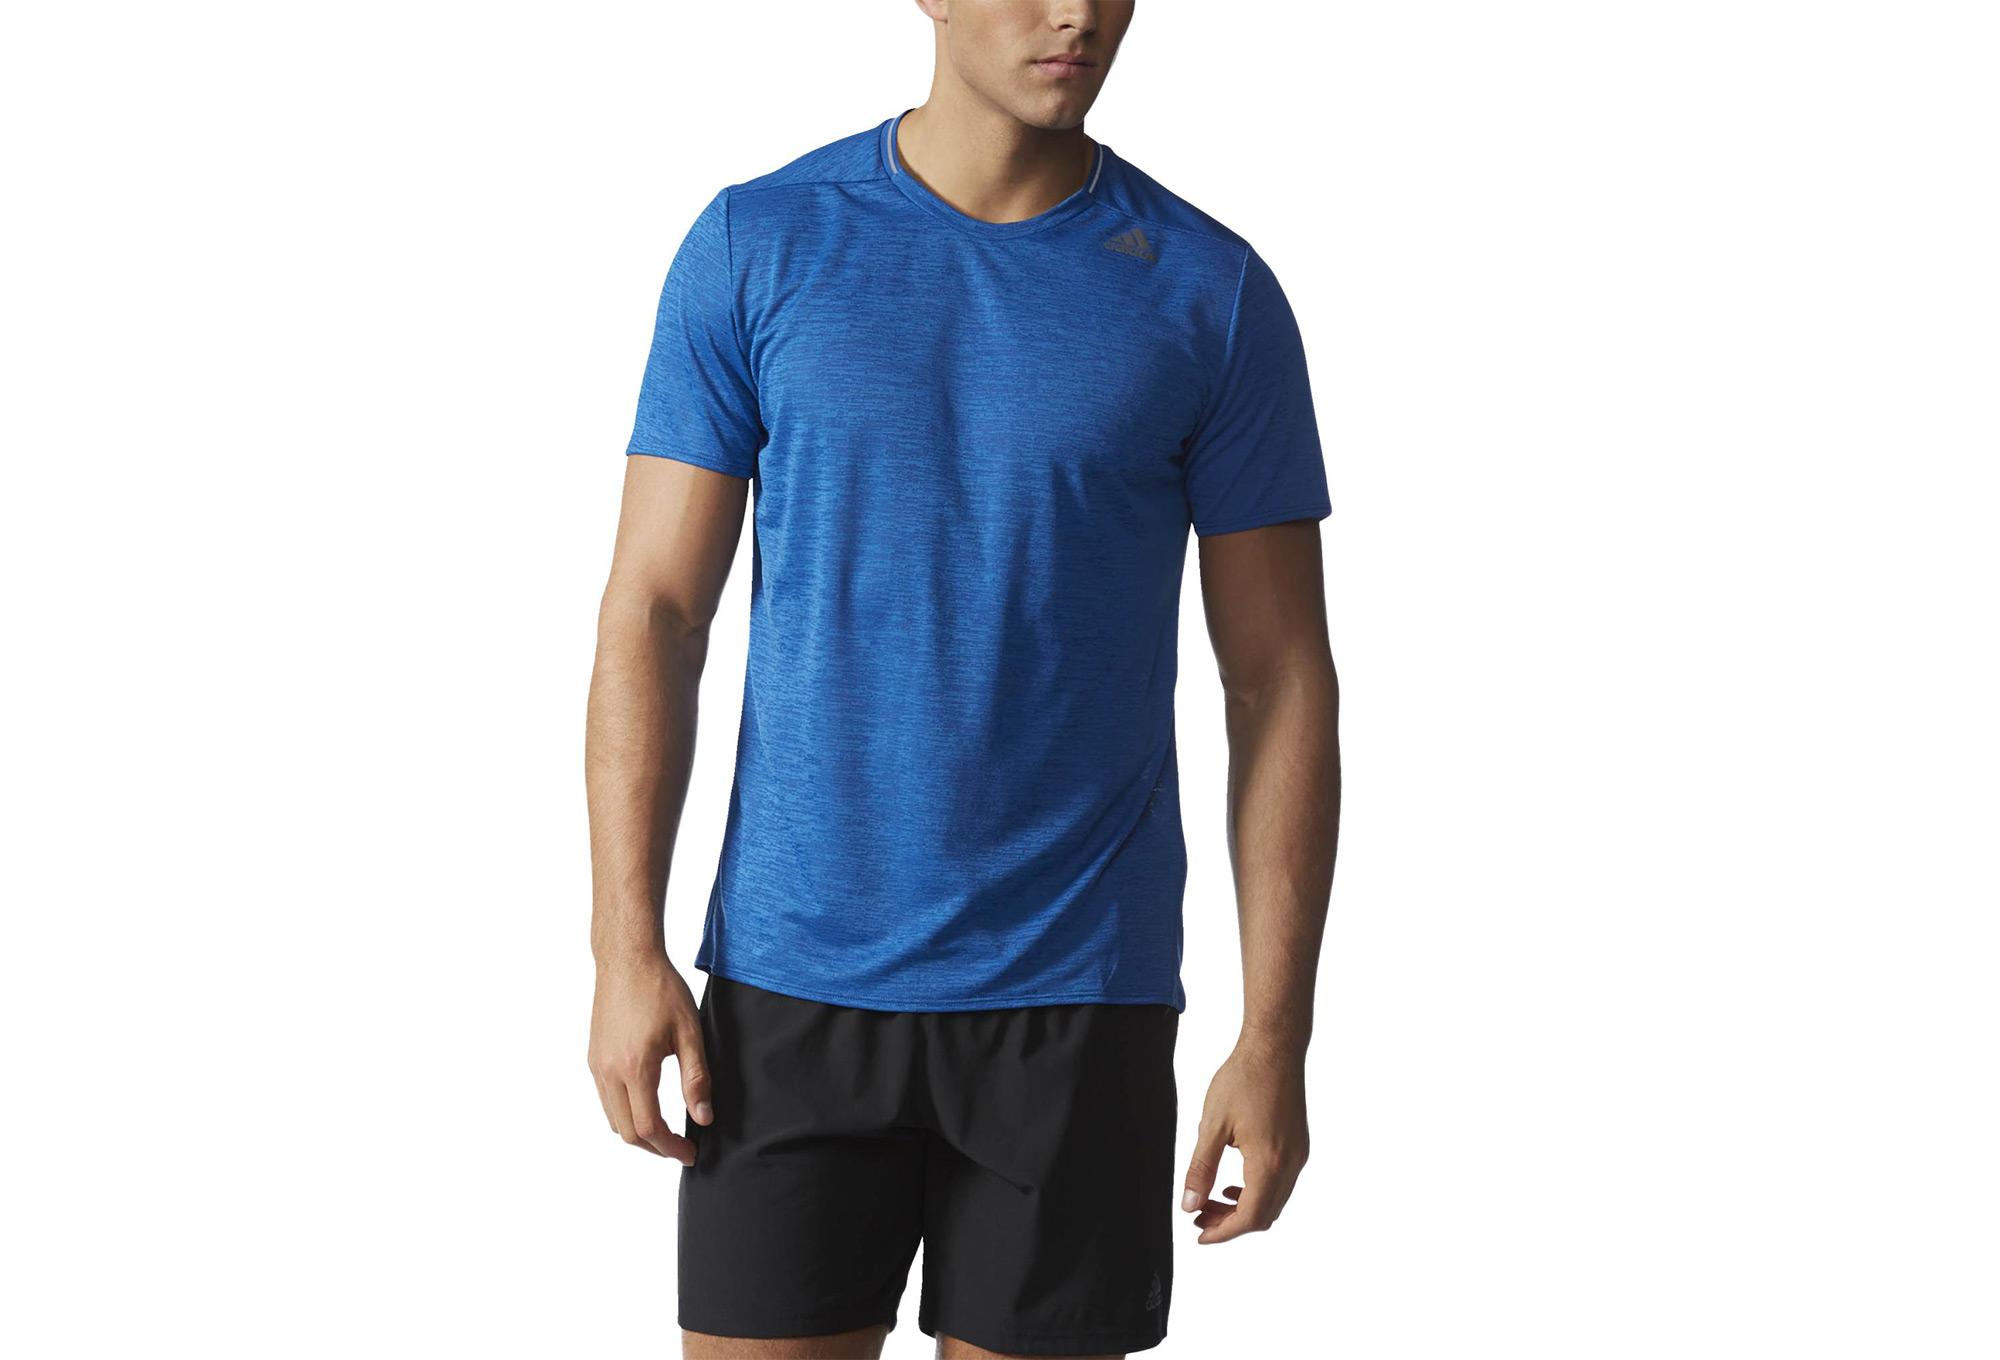 62f602bc7 adidas Supernova T-Shirt Blue